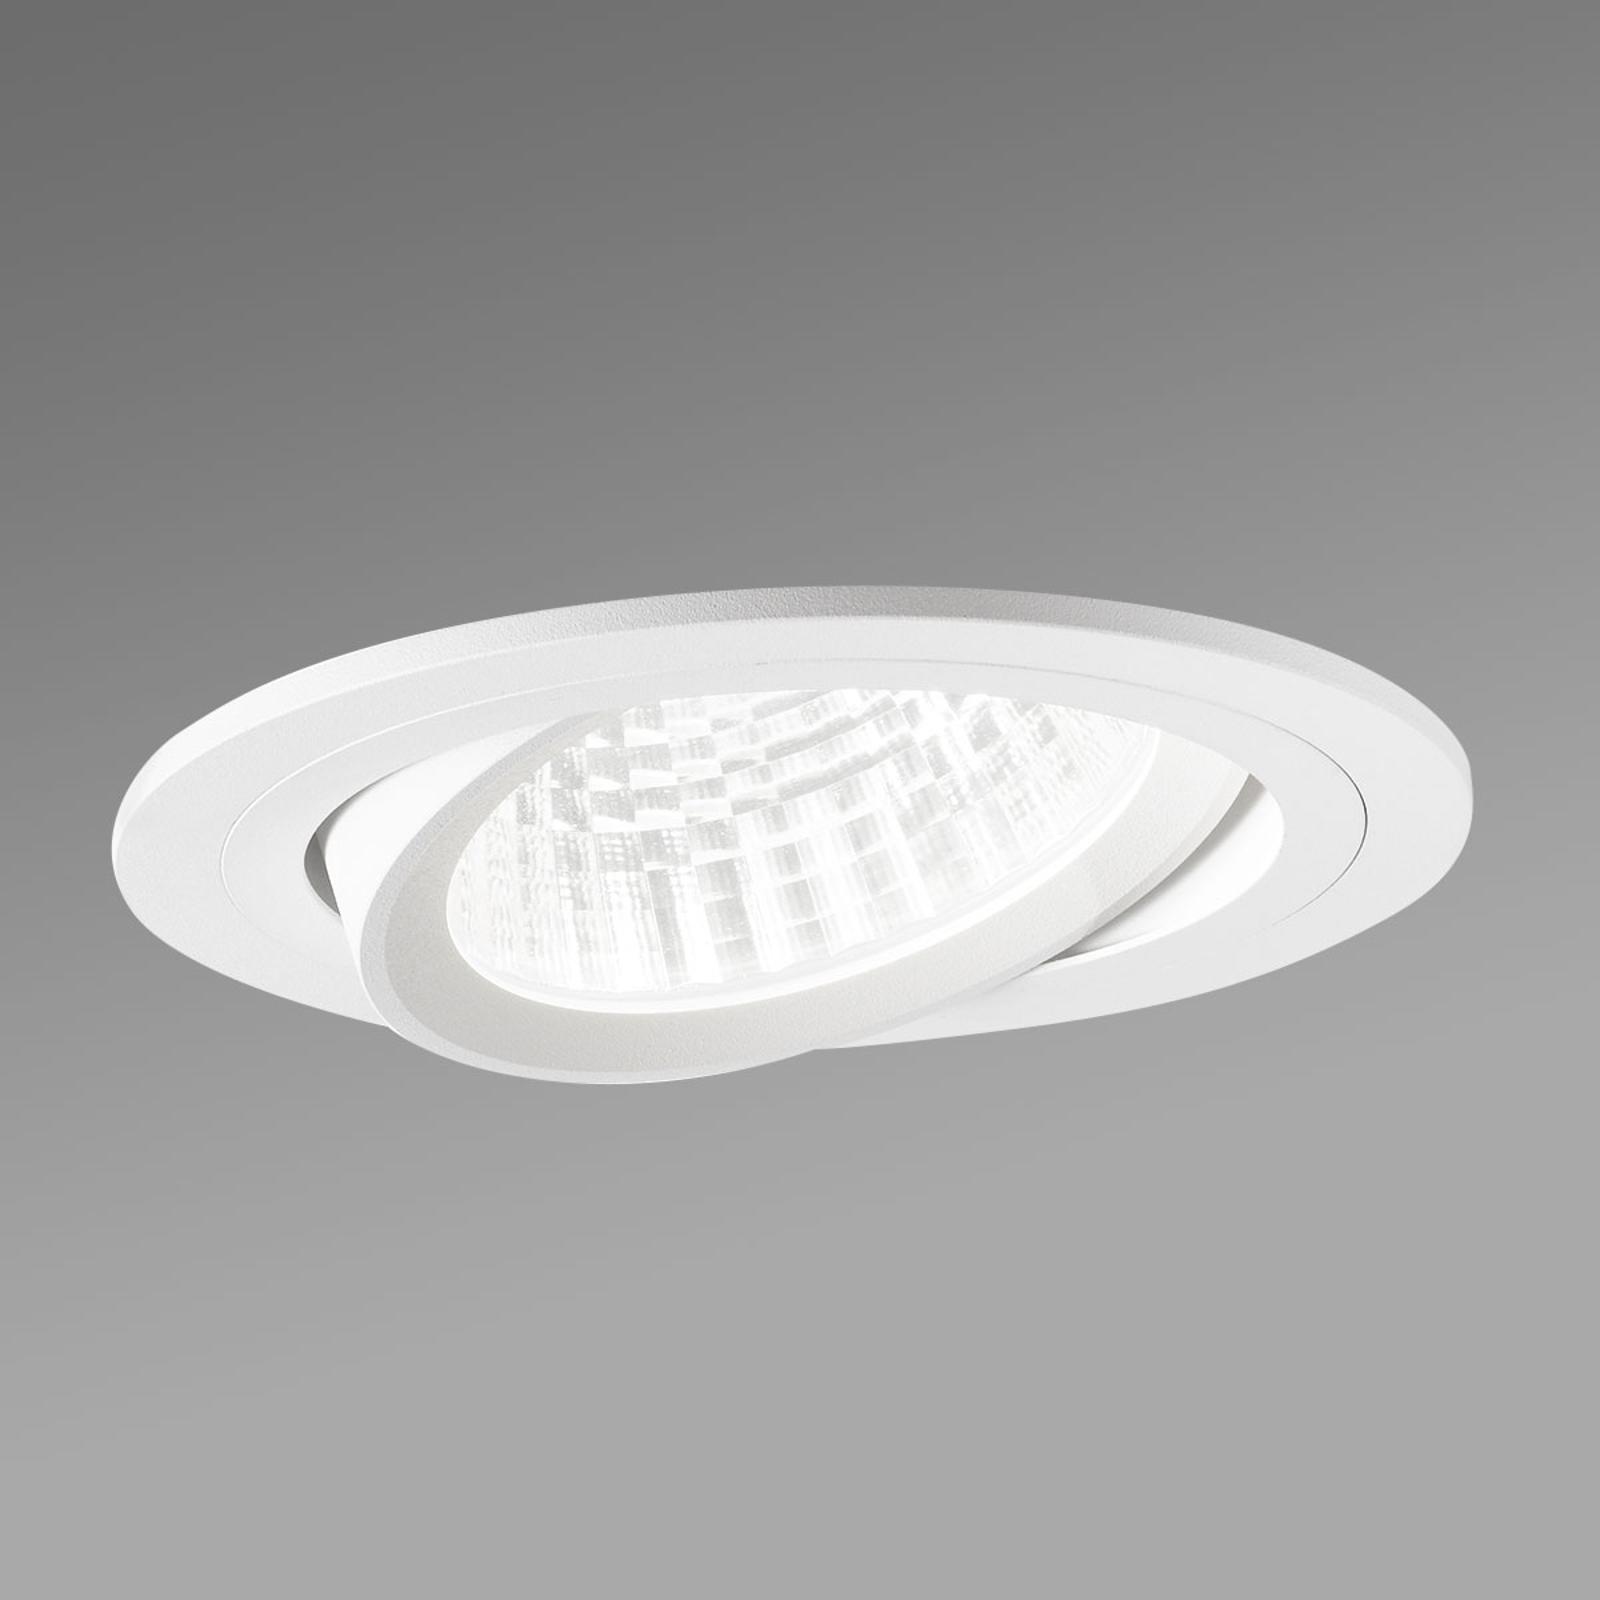 Reflektor wpuszczany LED Varo, 2 x 20° wychylany